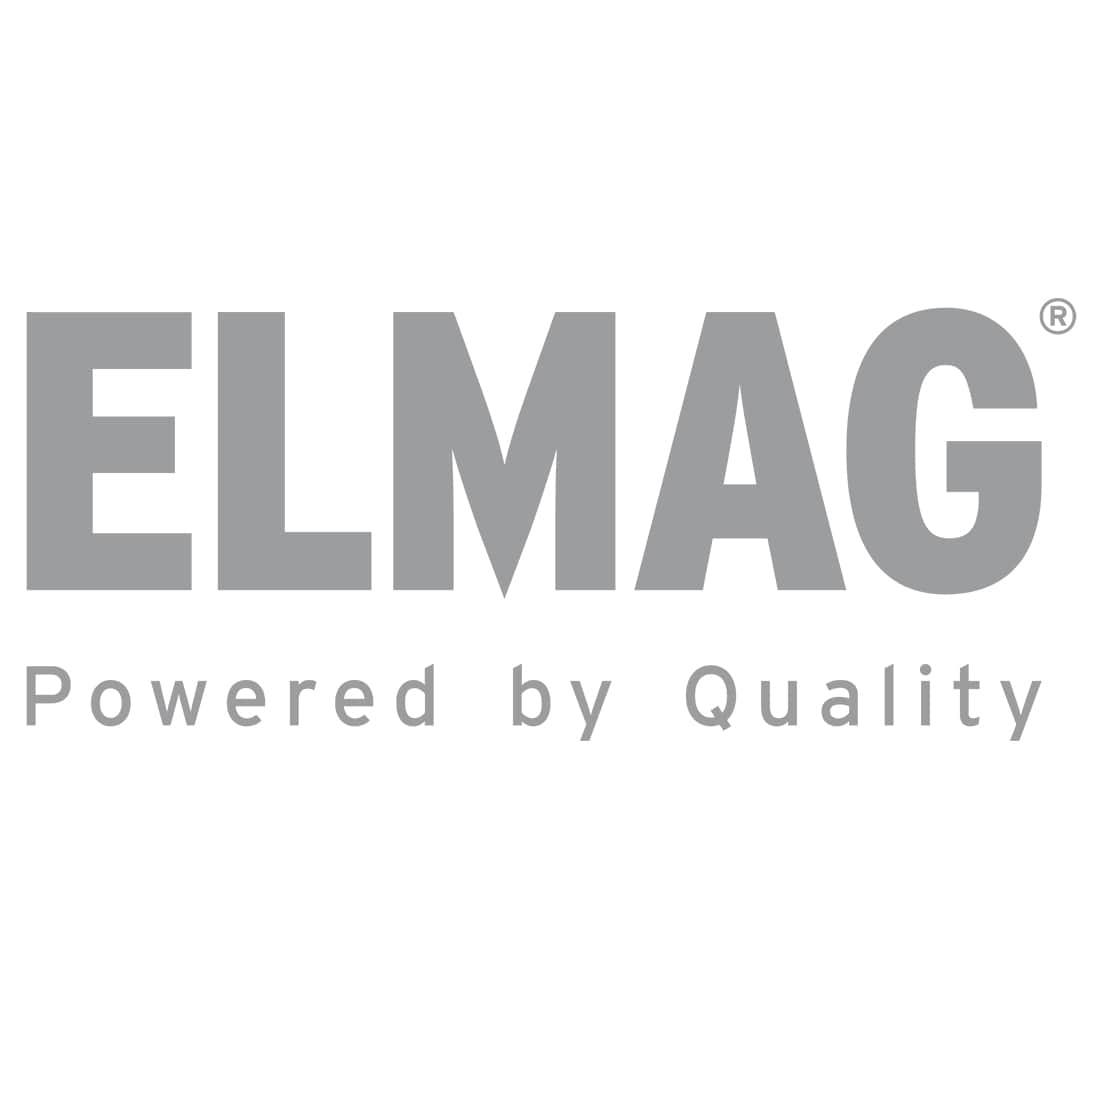 Hauptfilter zu Schweißrauchfilter fahrbar & Filter-Table